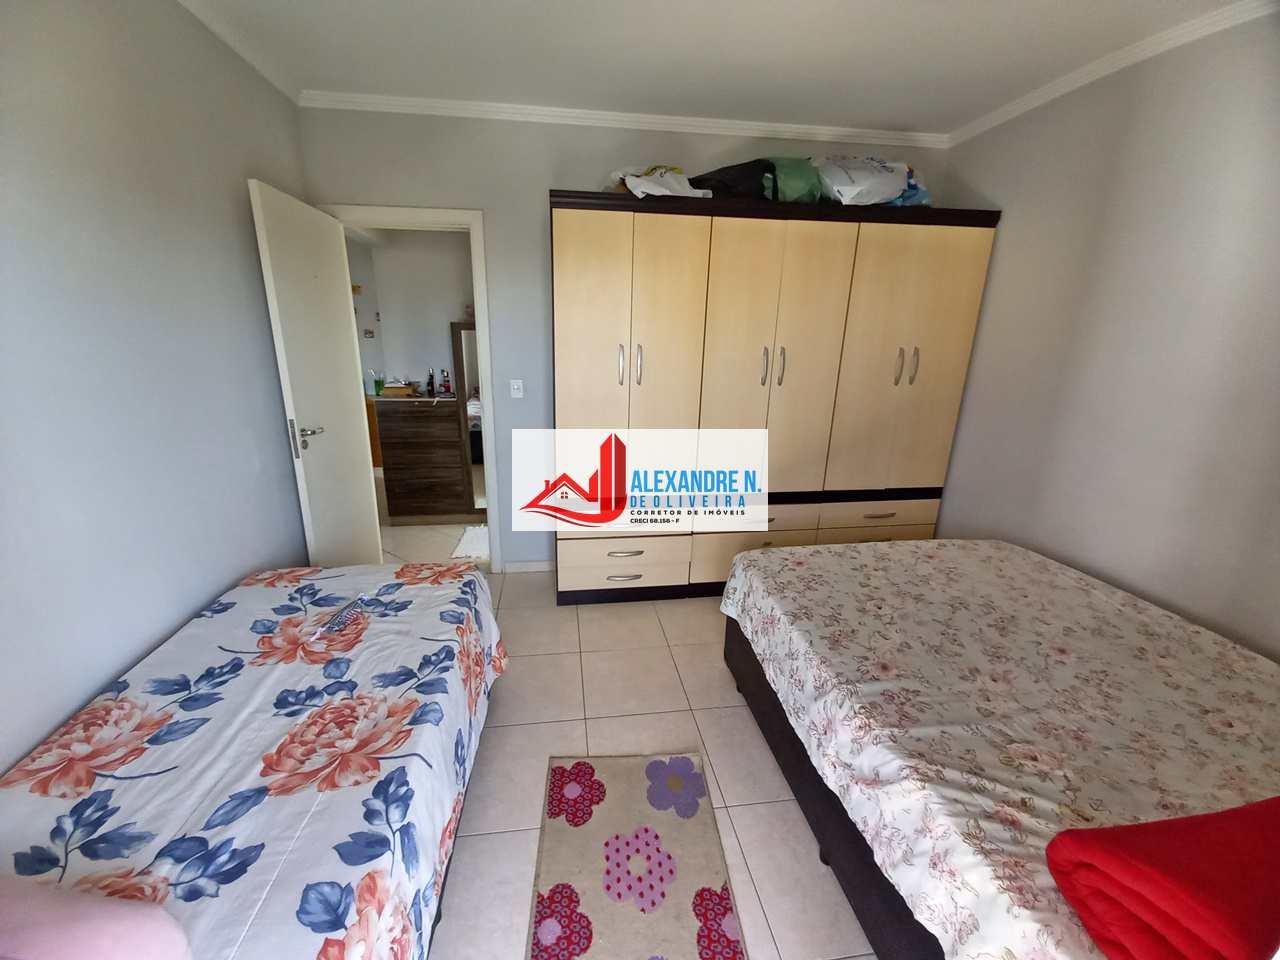 Apartamento 1 dorm, Tupi, Praia Grande - R$ 200 mil, AP00742